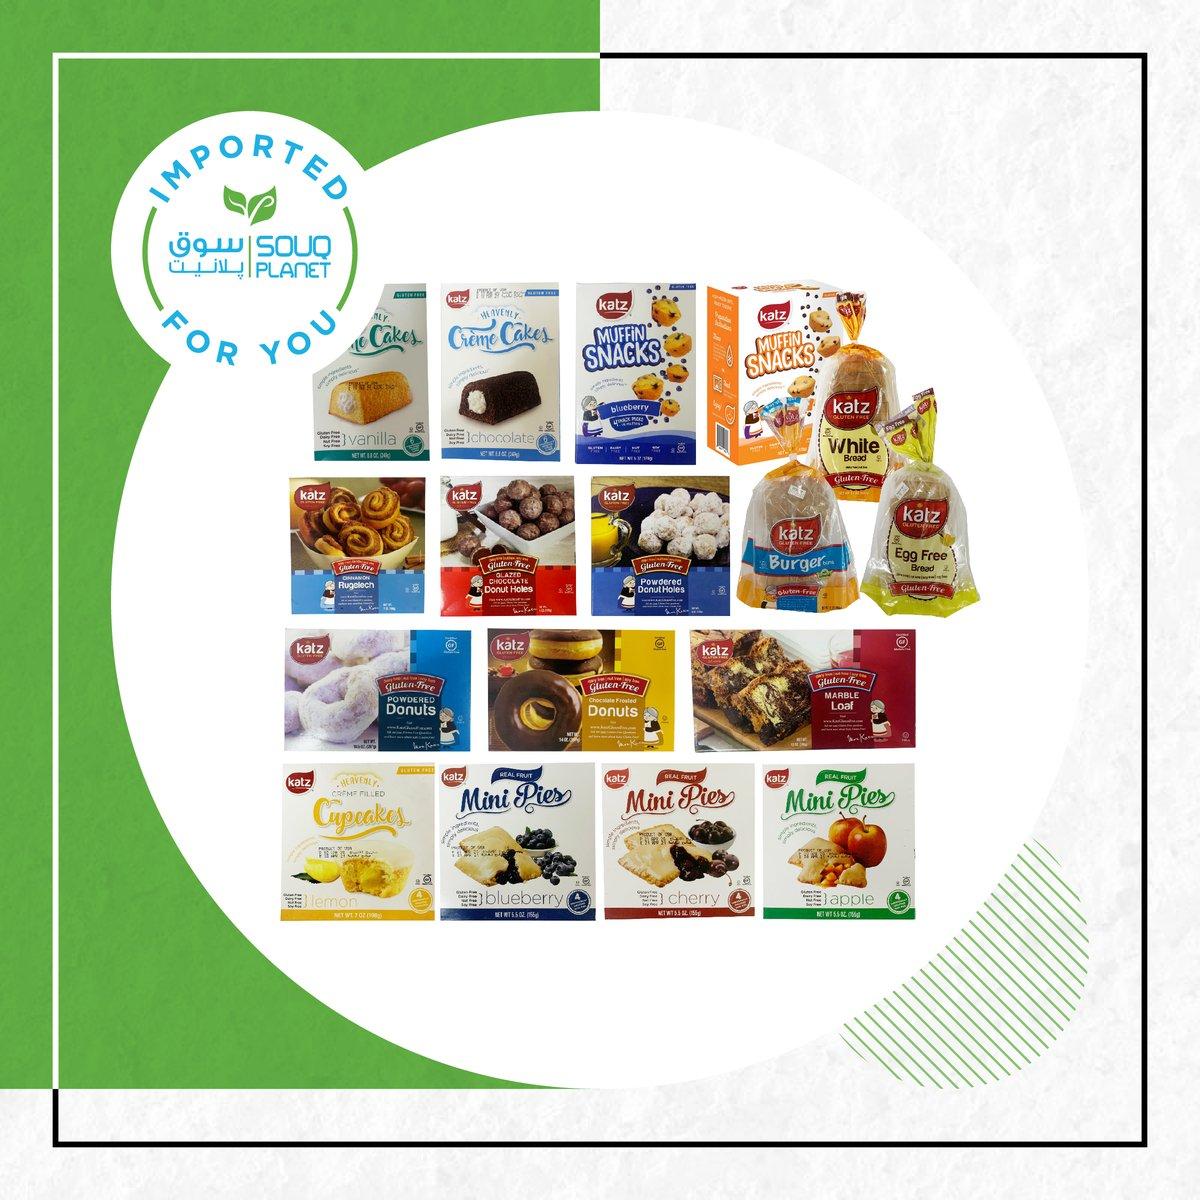 Are you shopping gluten-free?😍  Check out our wide range of Katz products, now available at your nearest Souq Planet 🌱   #souqplanet #onlineshopping #groceryshopping #inabudhabi #dubai #alain #uae #vegan #madinatzayed #smartshopper #safeplanet # #socialdistancing #abudhabi https://t.co/jxJHREmvLC